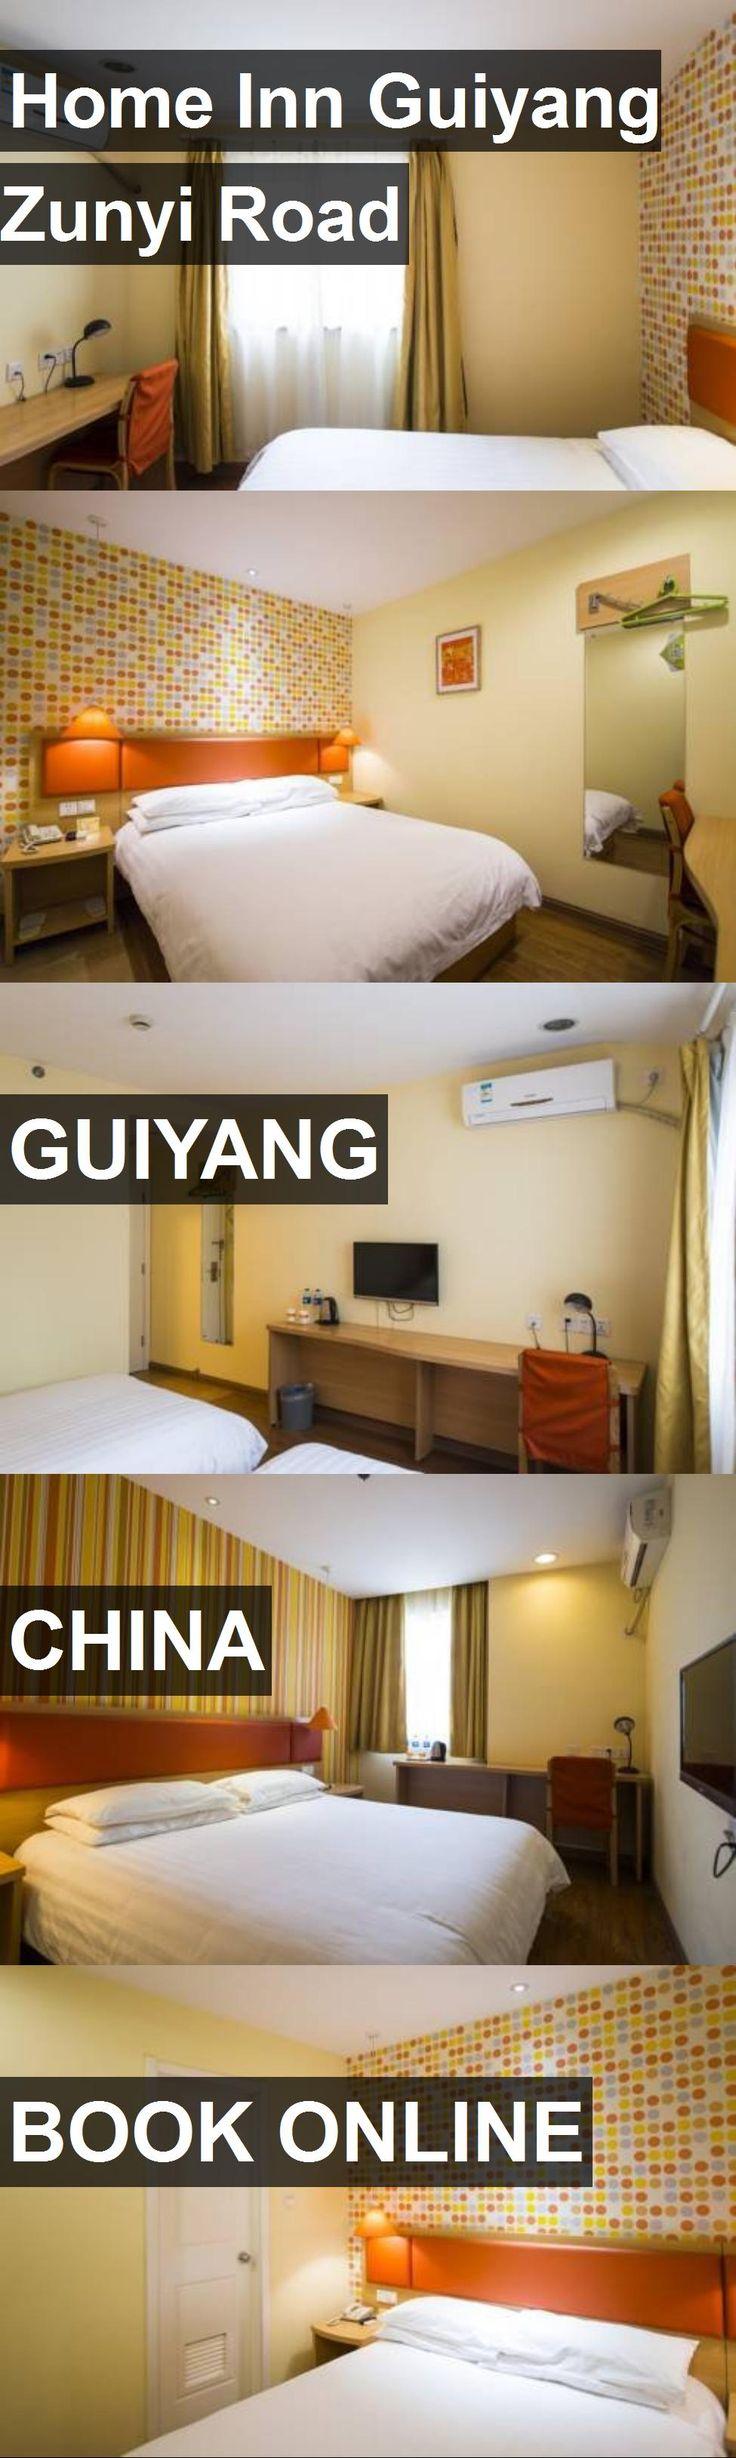 Hotel Home Inn Guiyang Zunyi Road in Guiyang, China. For more information, photos, reviews and best prices please follow the link. #China #Guiyang #travel #vacation #hotel